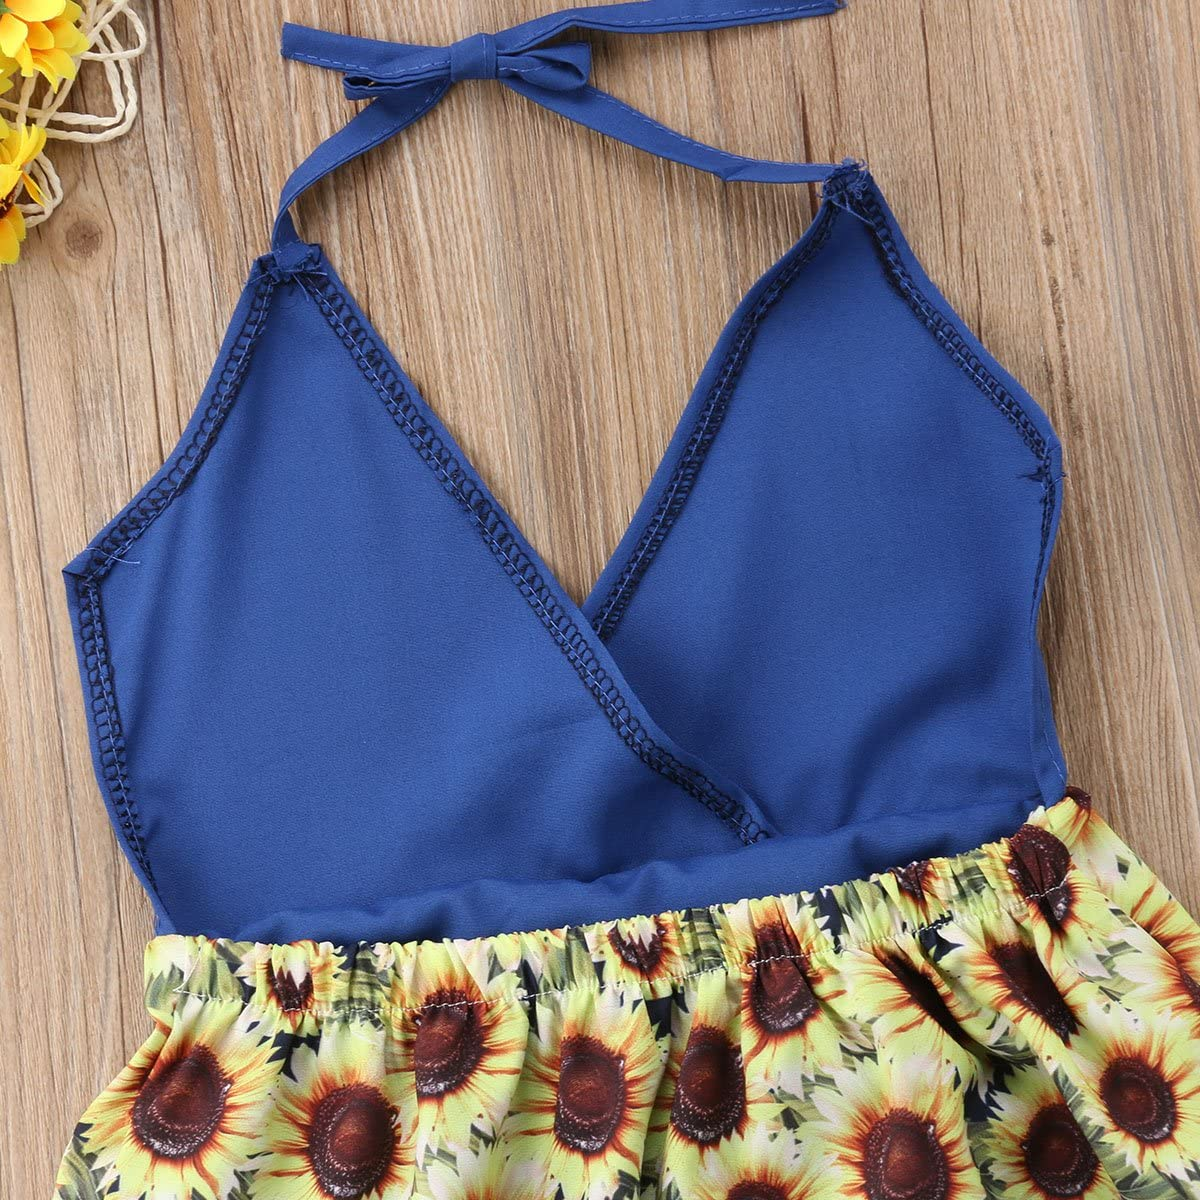 YAZAD Newborn Infant Toddler Baby Girl Sunflower Dress Halter Floral Tassel Sundress Princess Dress Playwear Summer Outfit